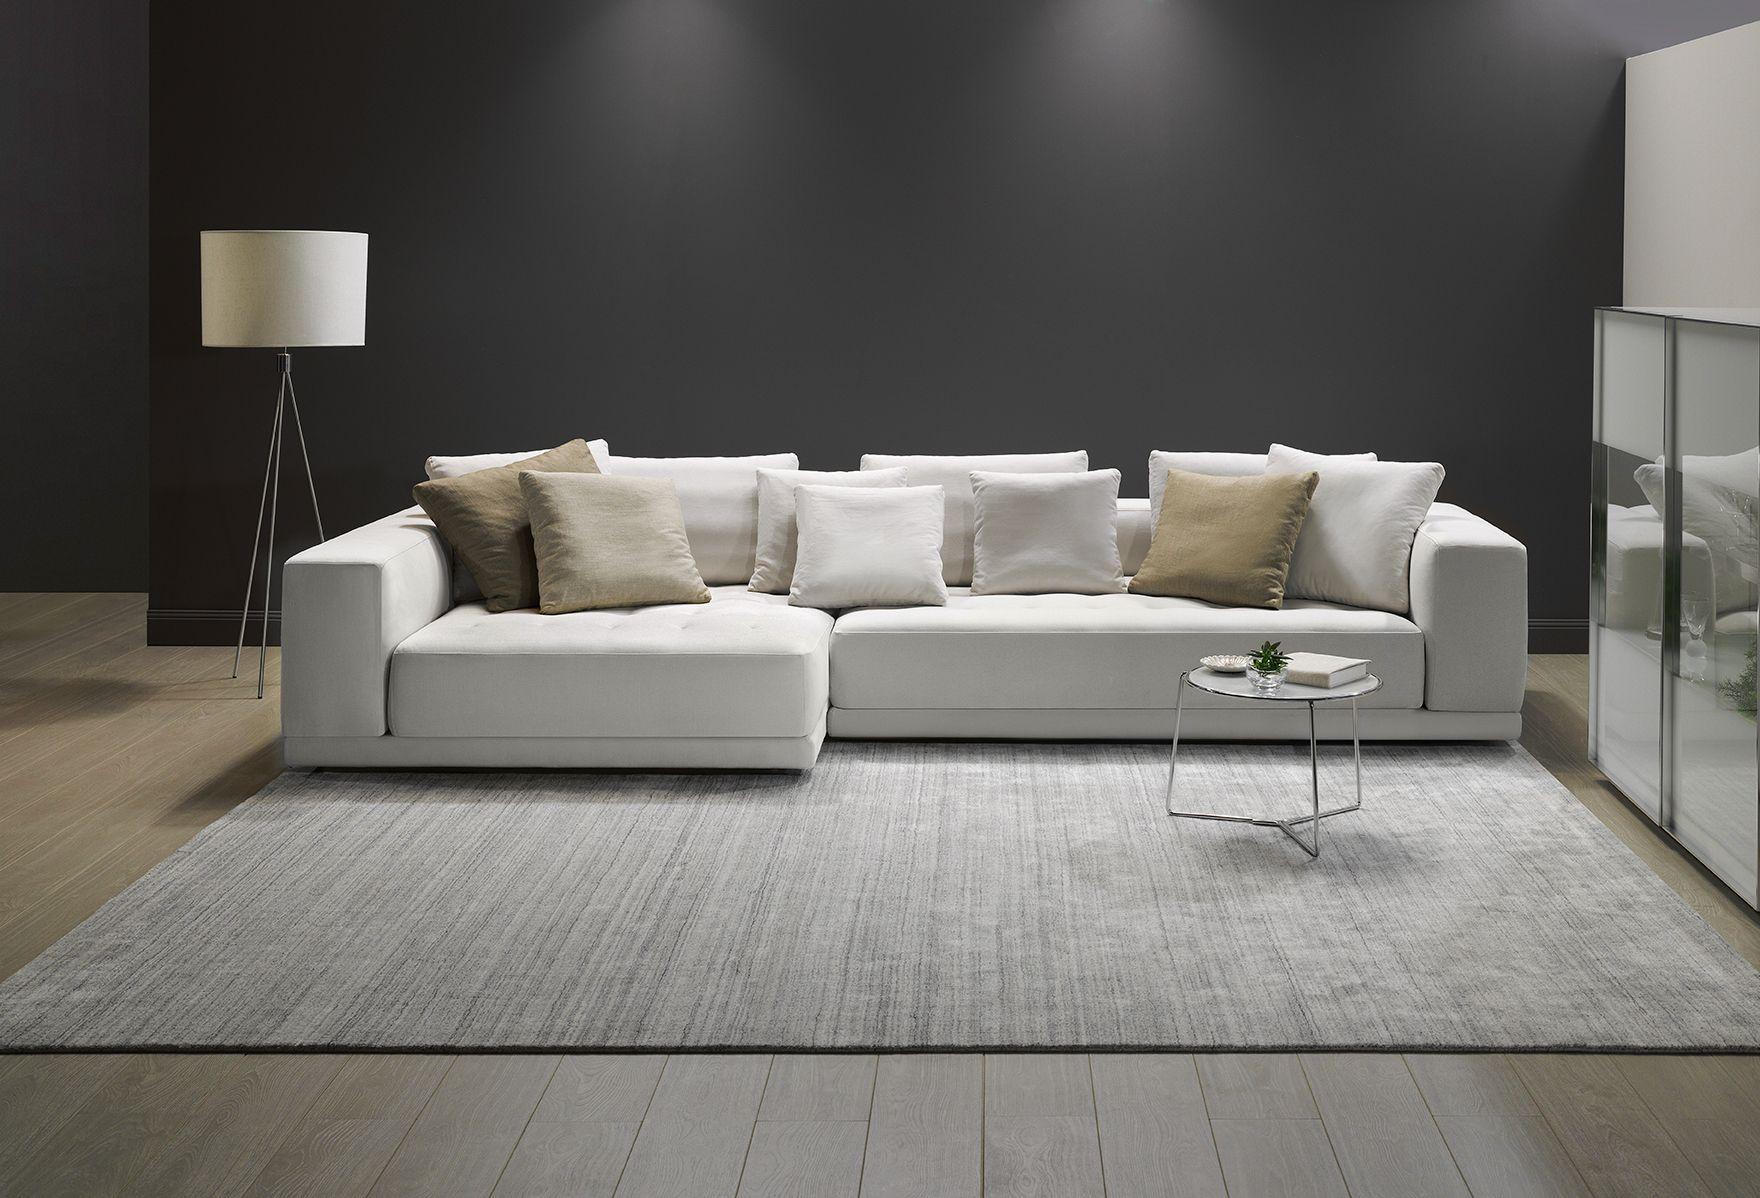 Sofa King Furniture King Furniture Strata Fabric Or ...